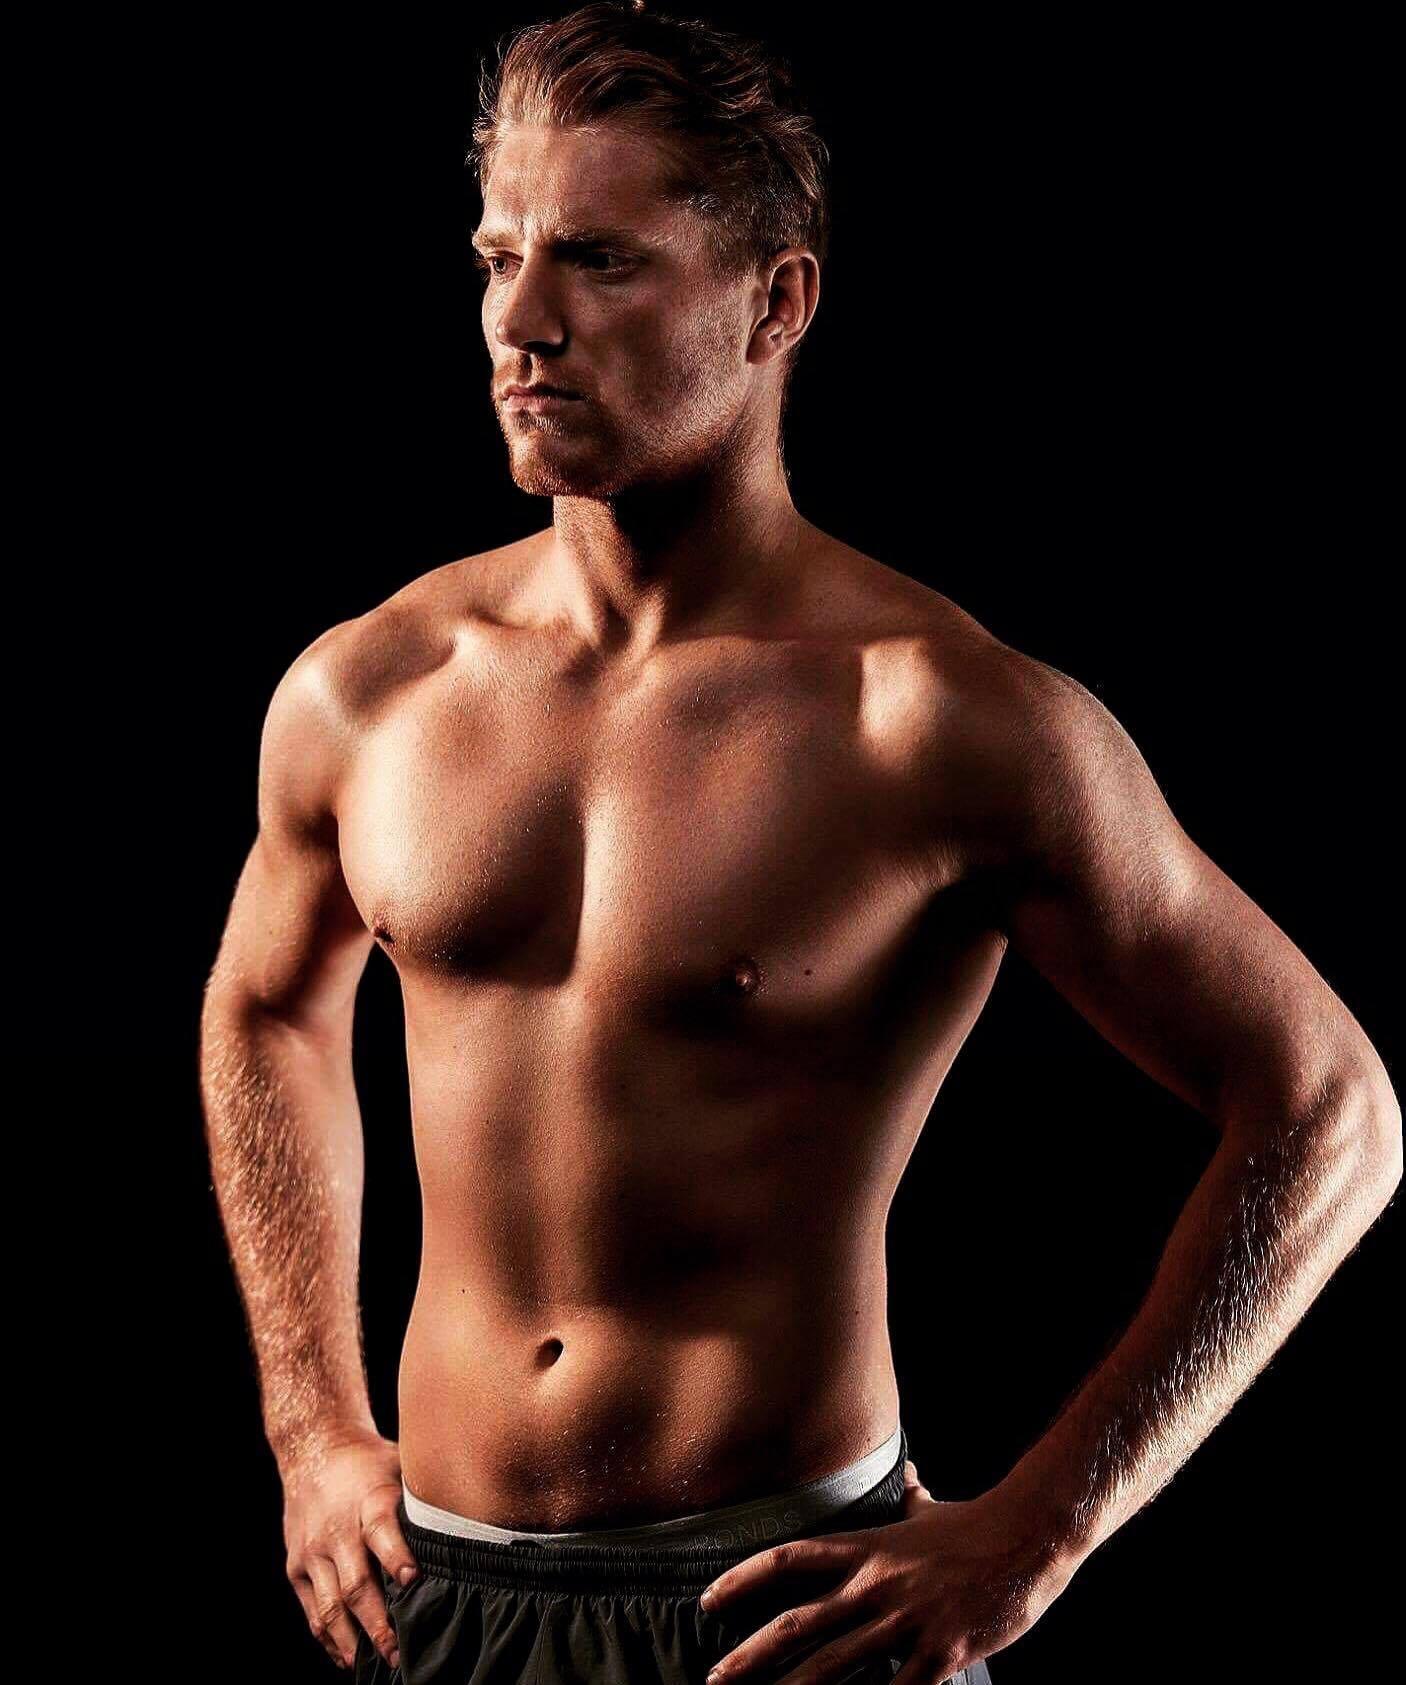 Adam topless waiter